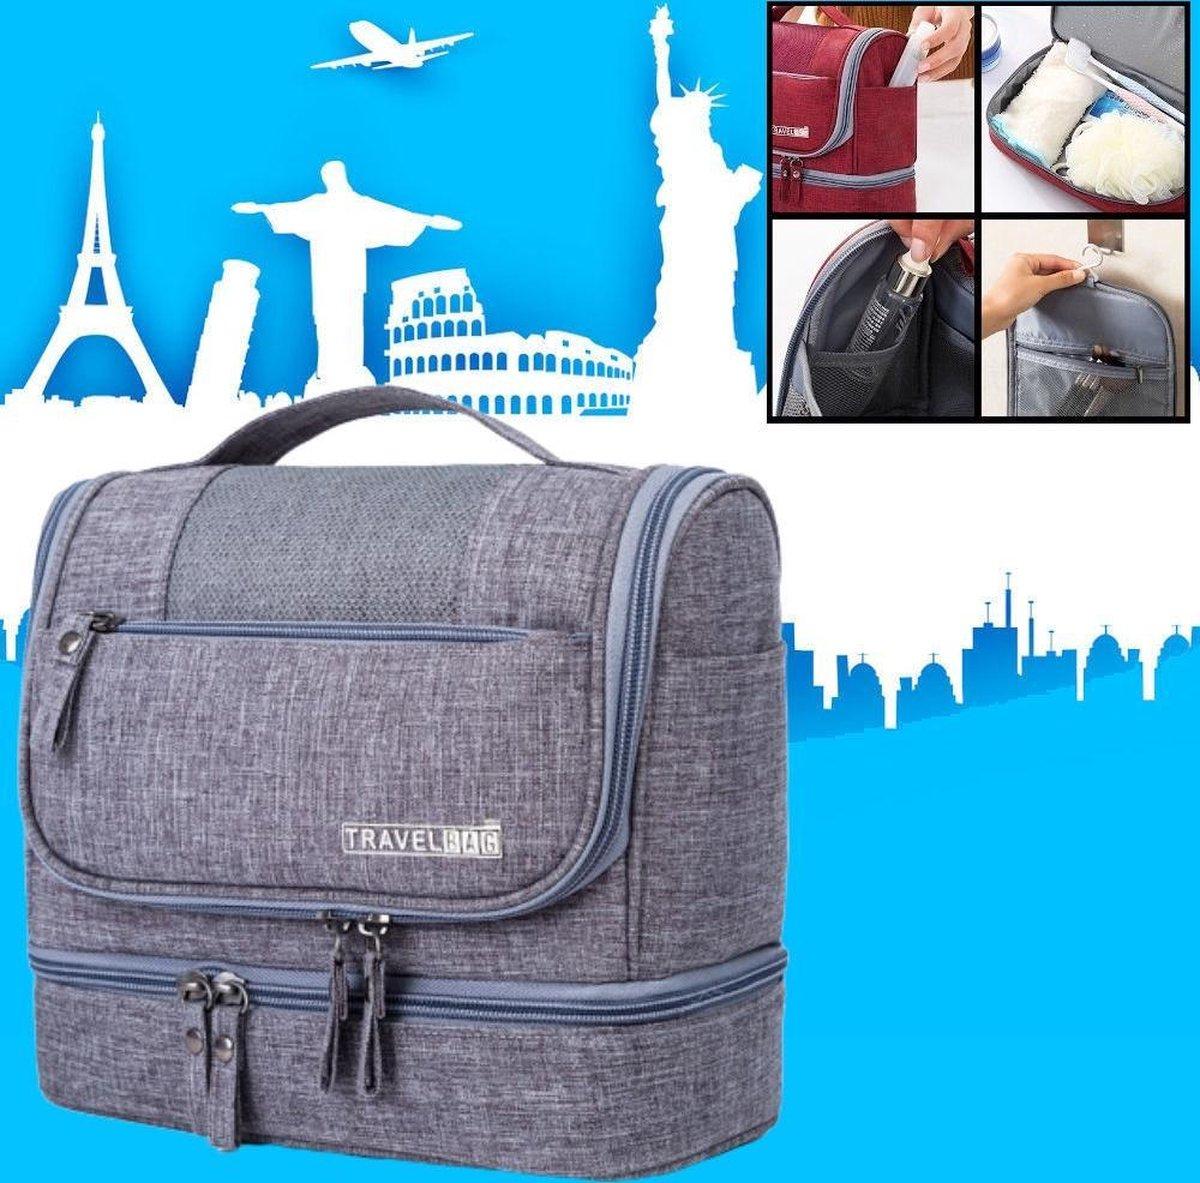 Decopatent® Ophangbare Toilettas met Haak - Dames & Heren - Travel bag Organizer - Waterdichte Reis